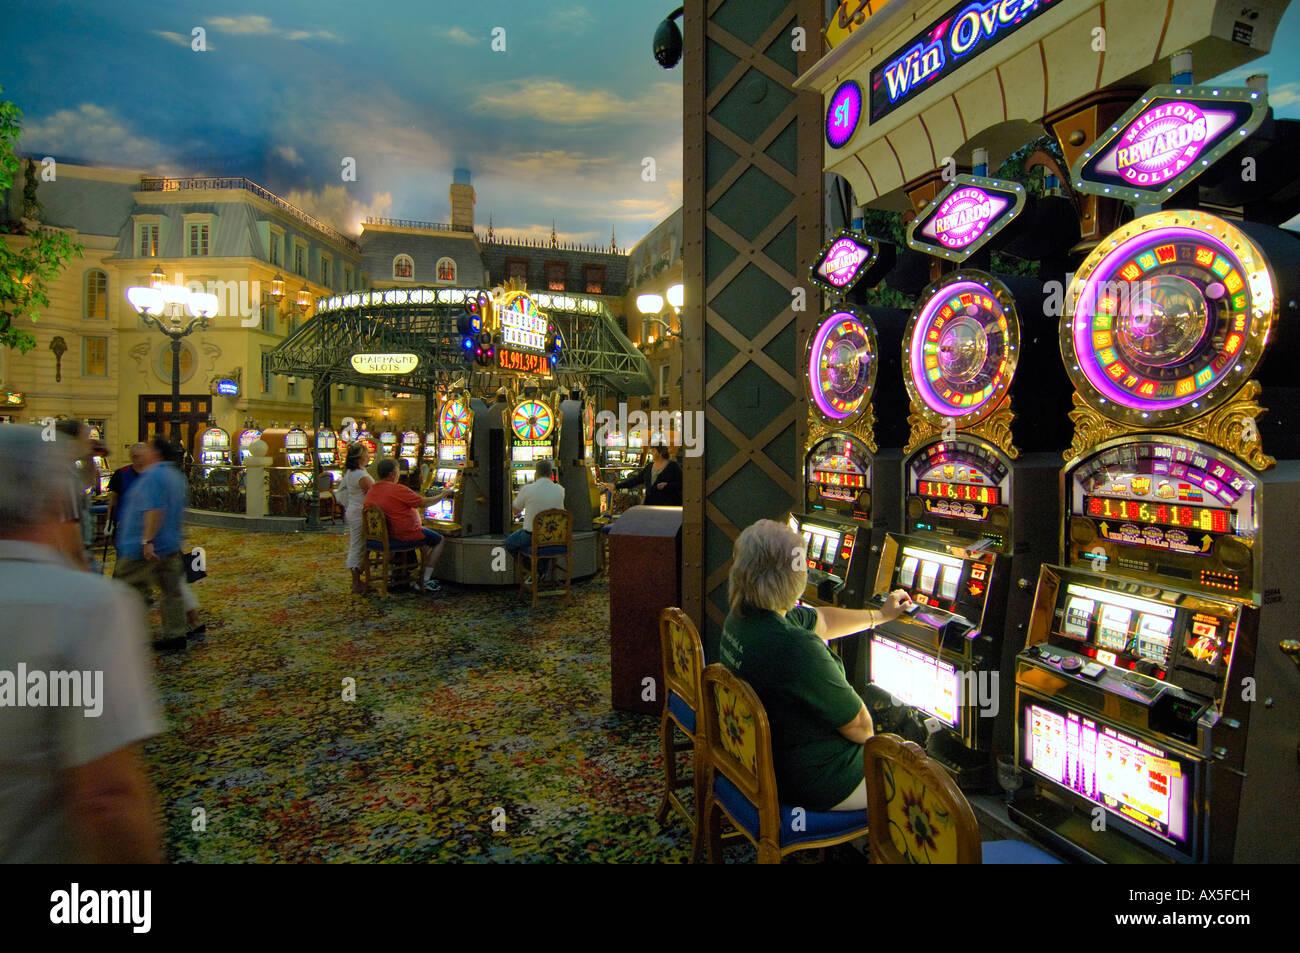 Blvd casino vegas 2 62.4.84.53 casino cmp pp rfe.php trafc